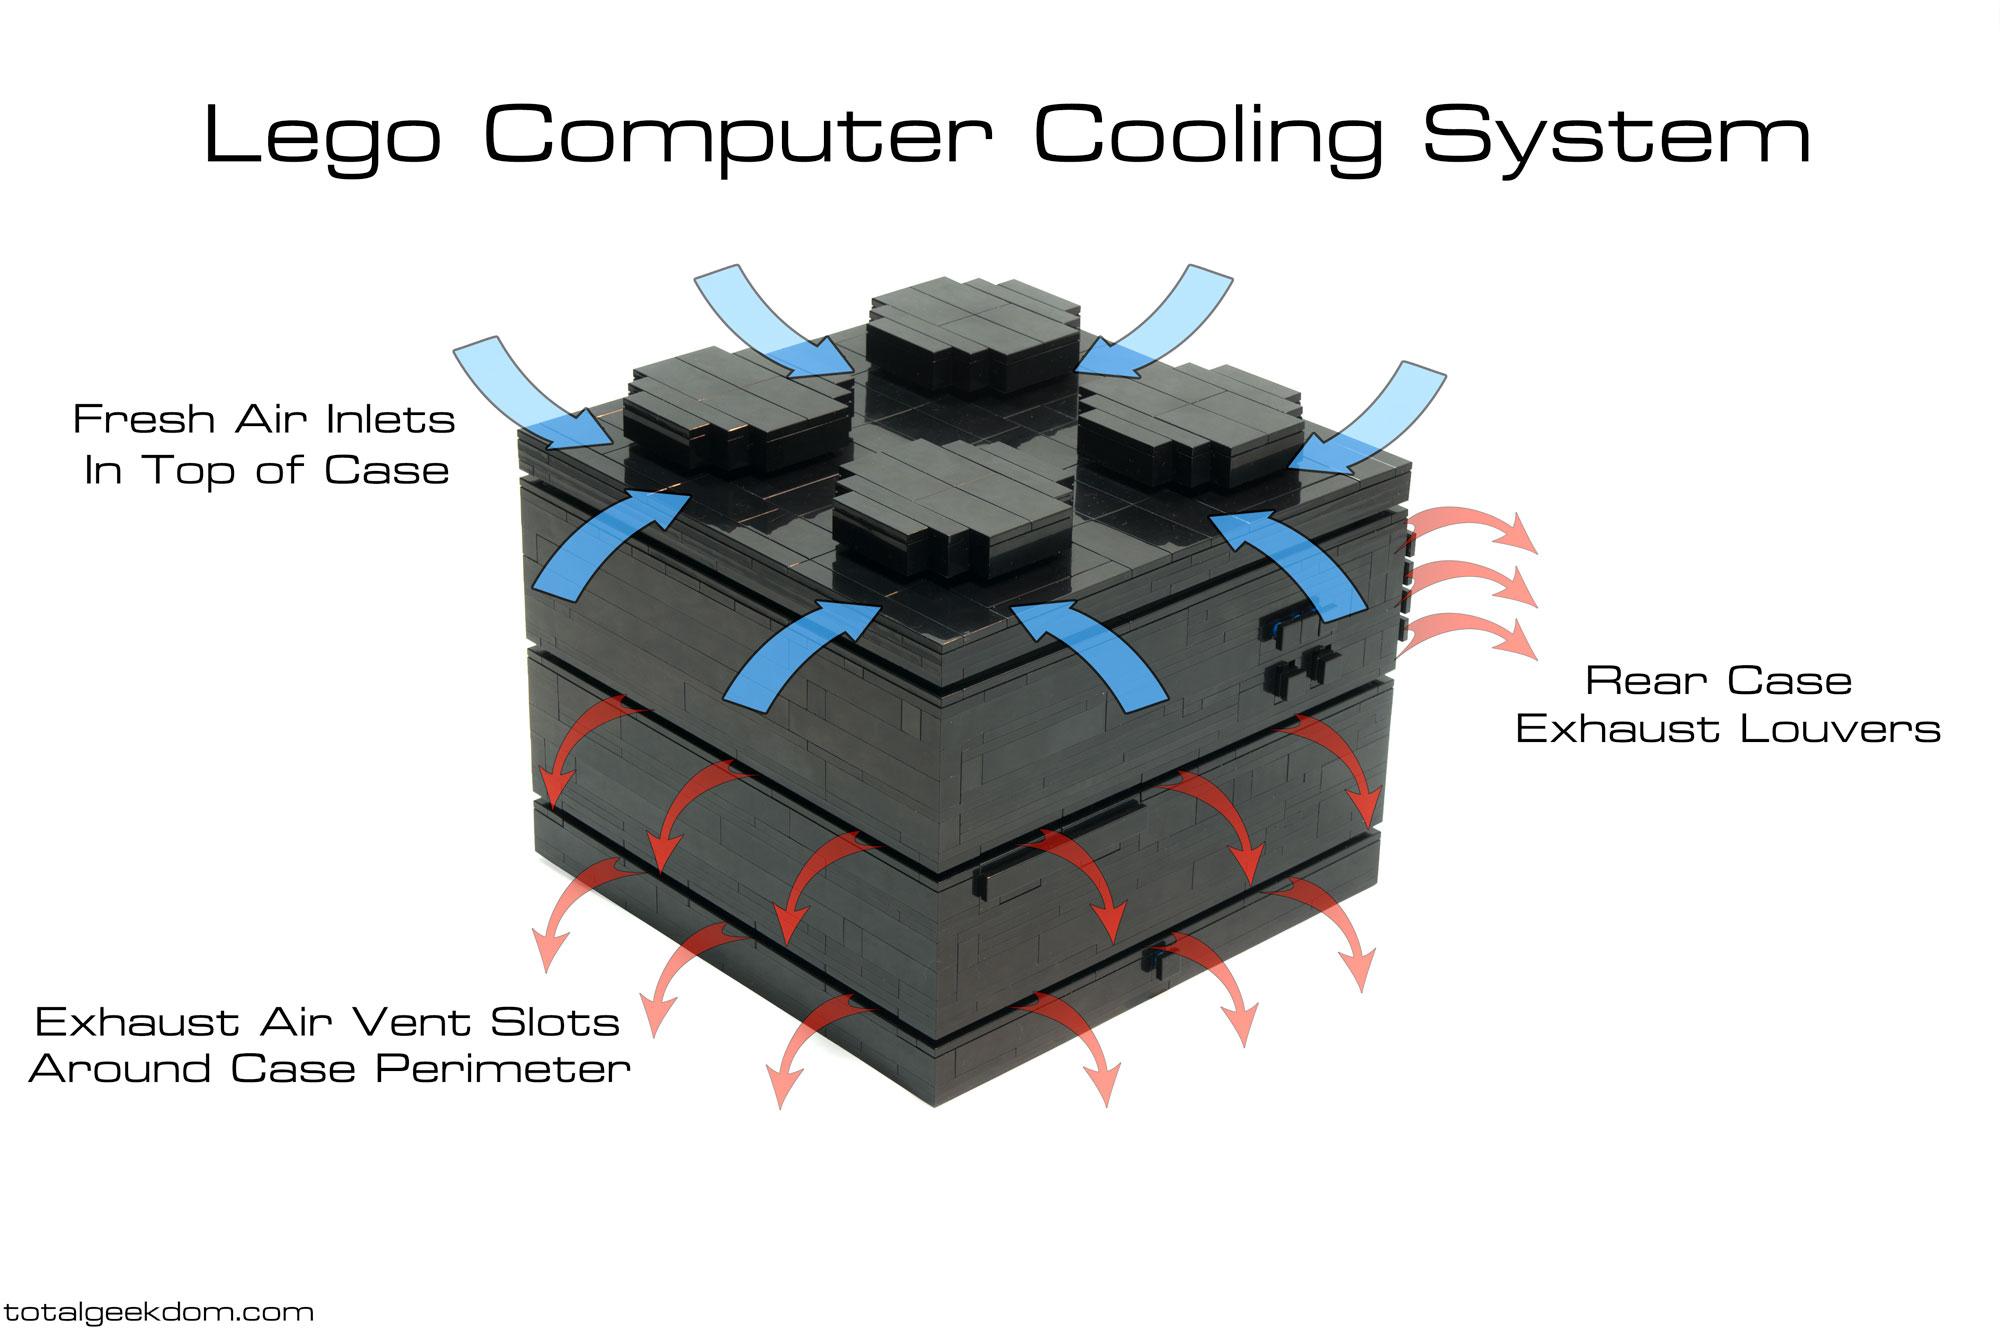 Lego Computer Total Geekdom